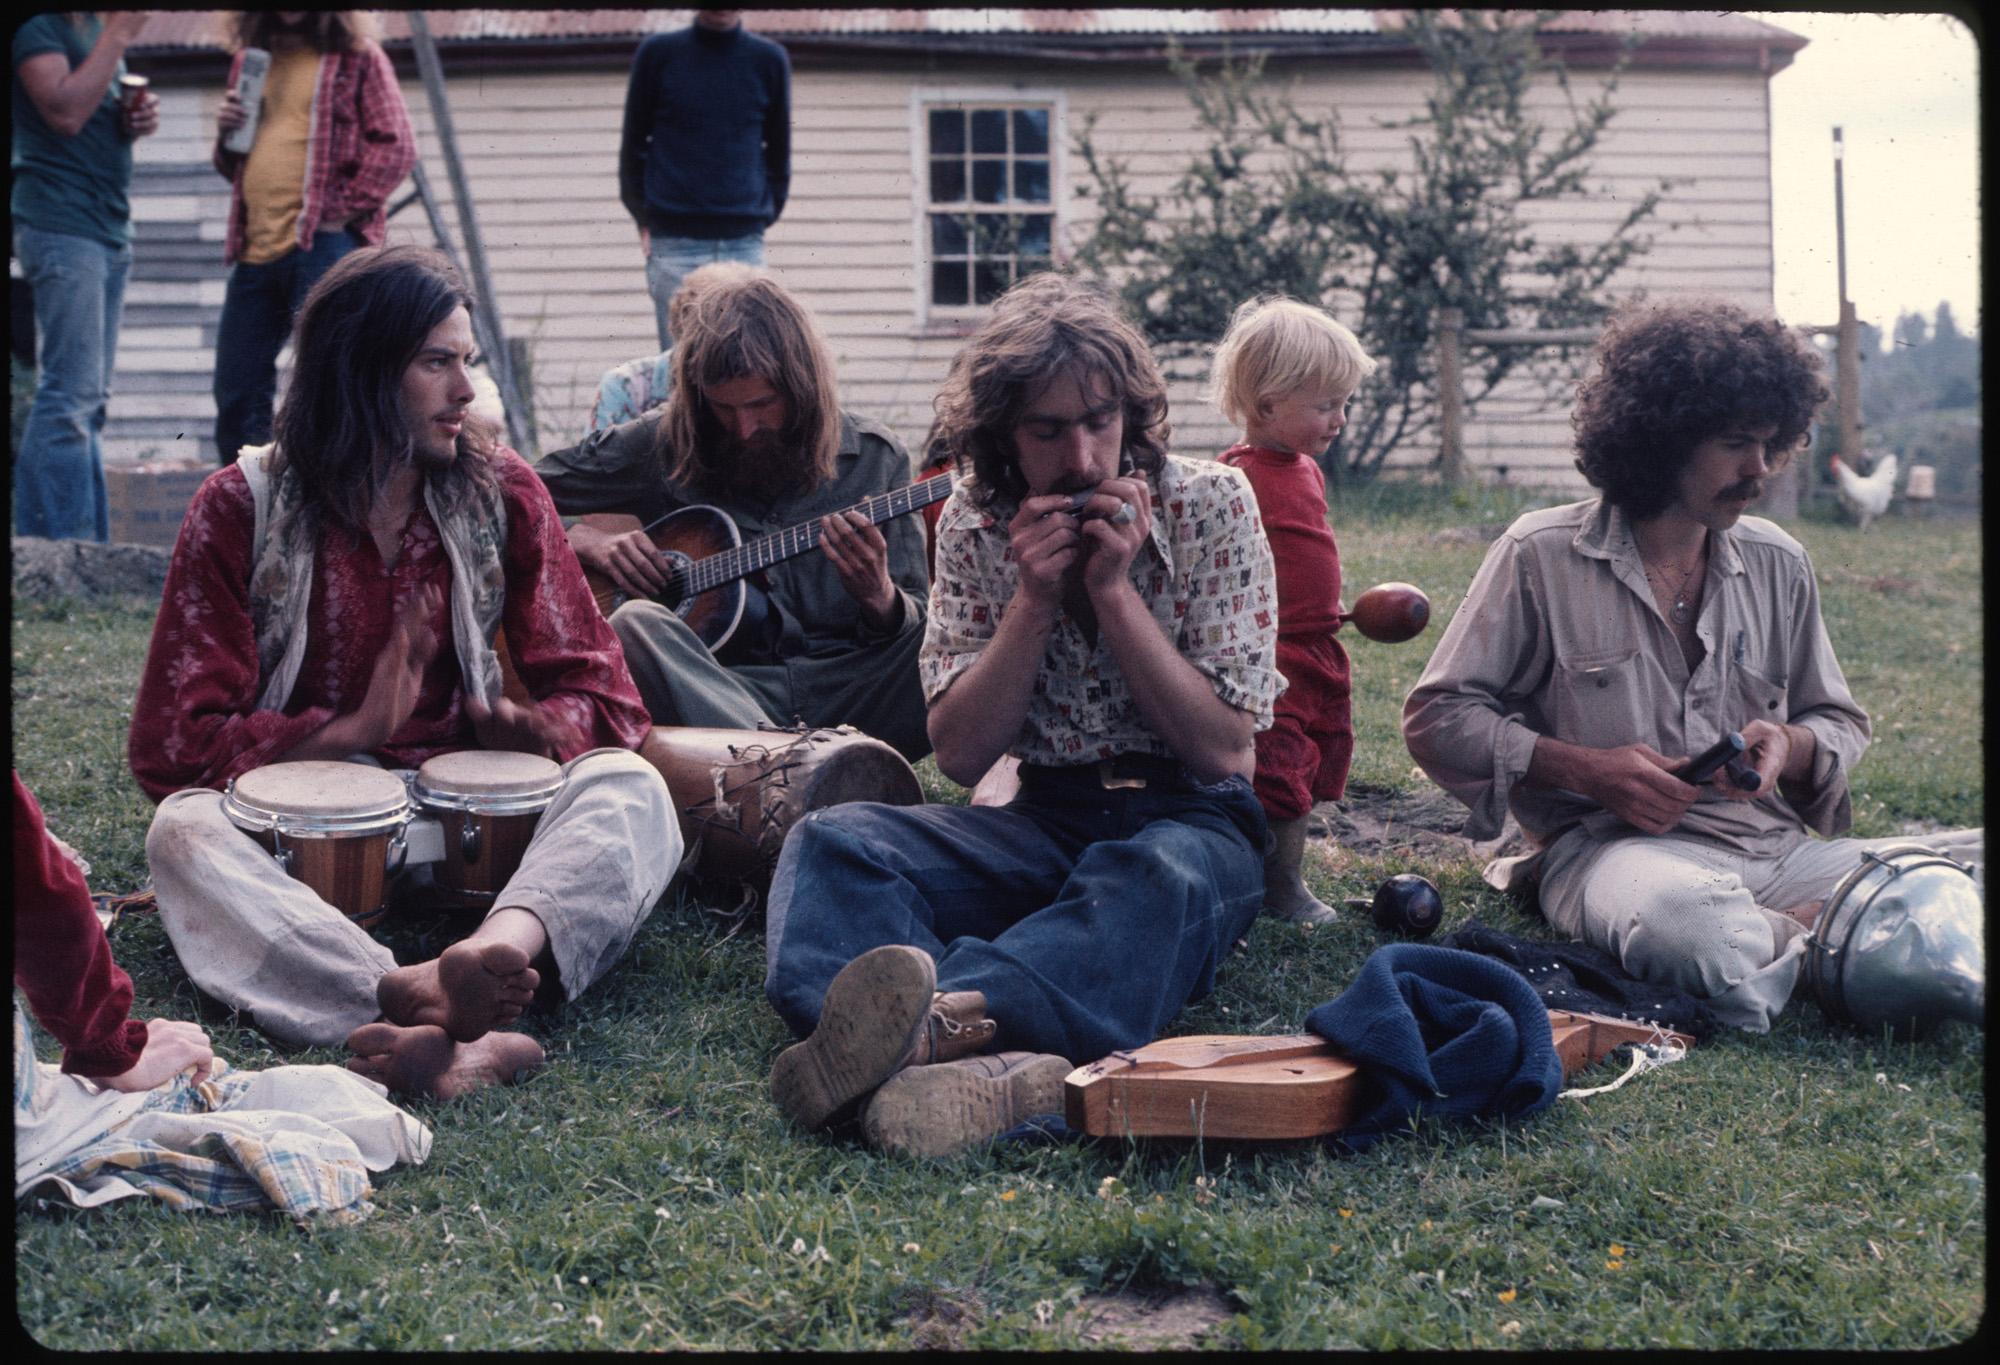 Gathering of musicians in Nimbin